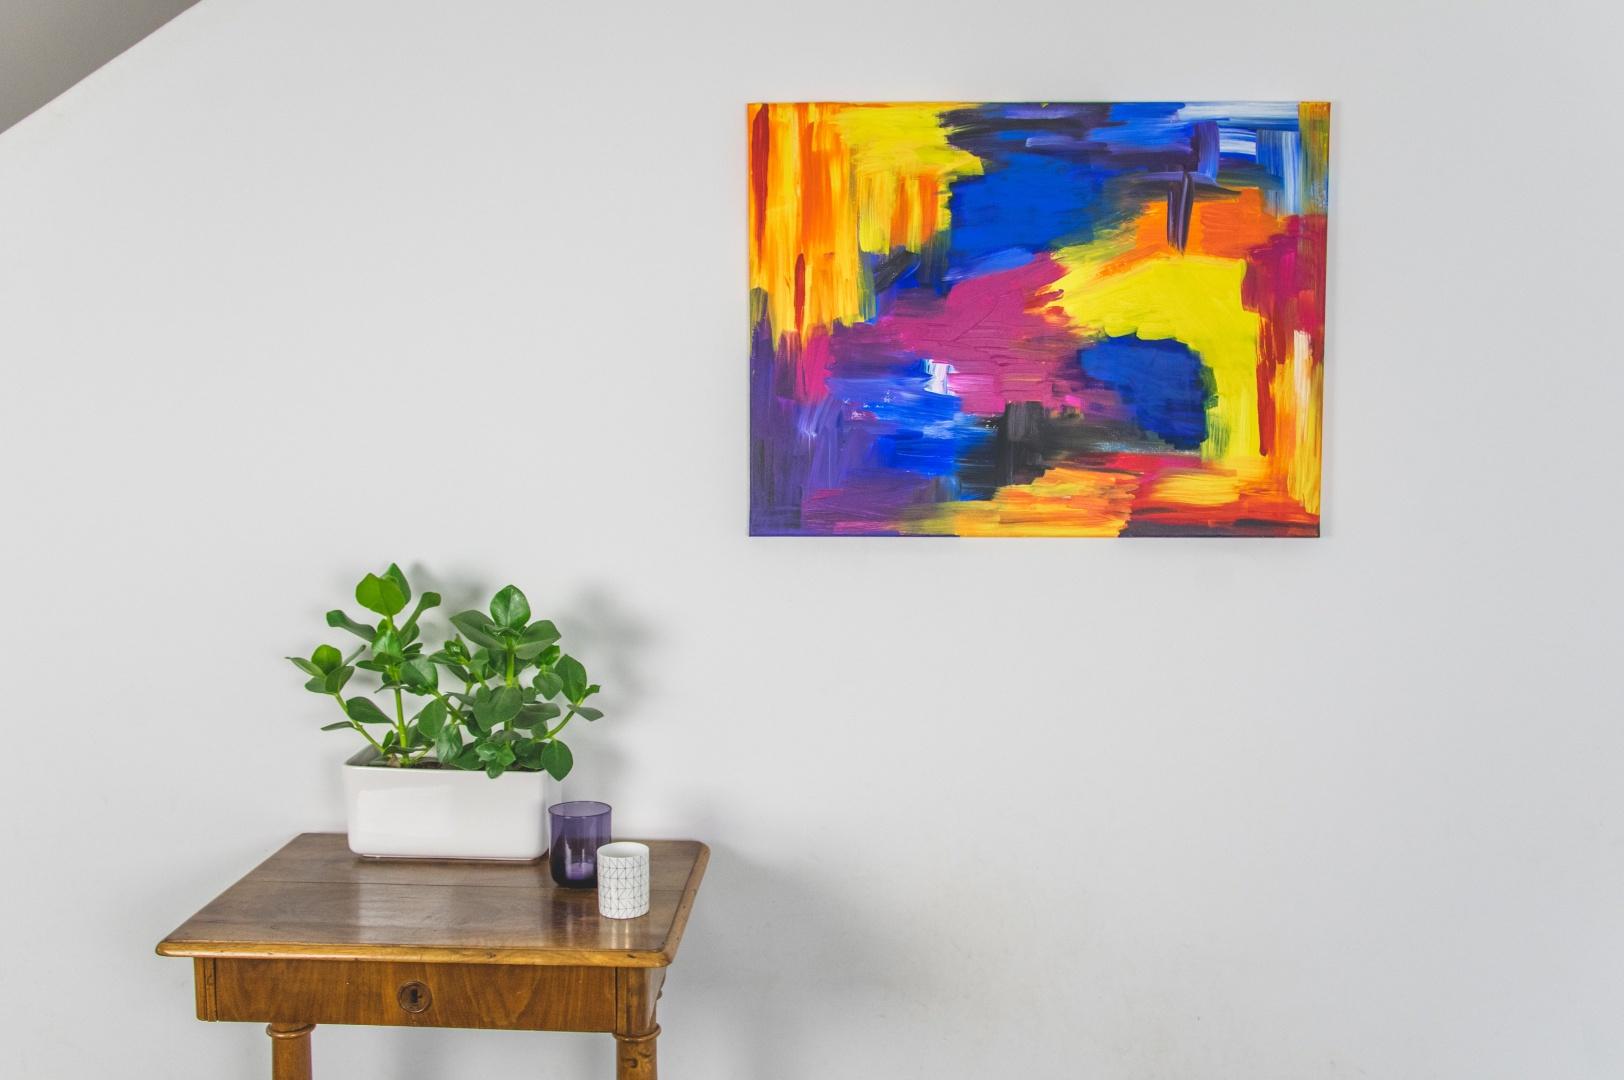 Hangemaltes absraktes, großes Acryl-Leinwandbild, big wall art